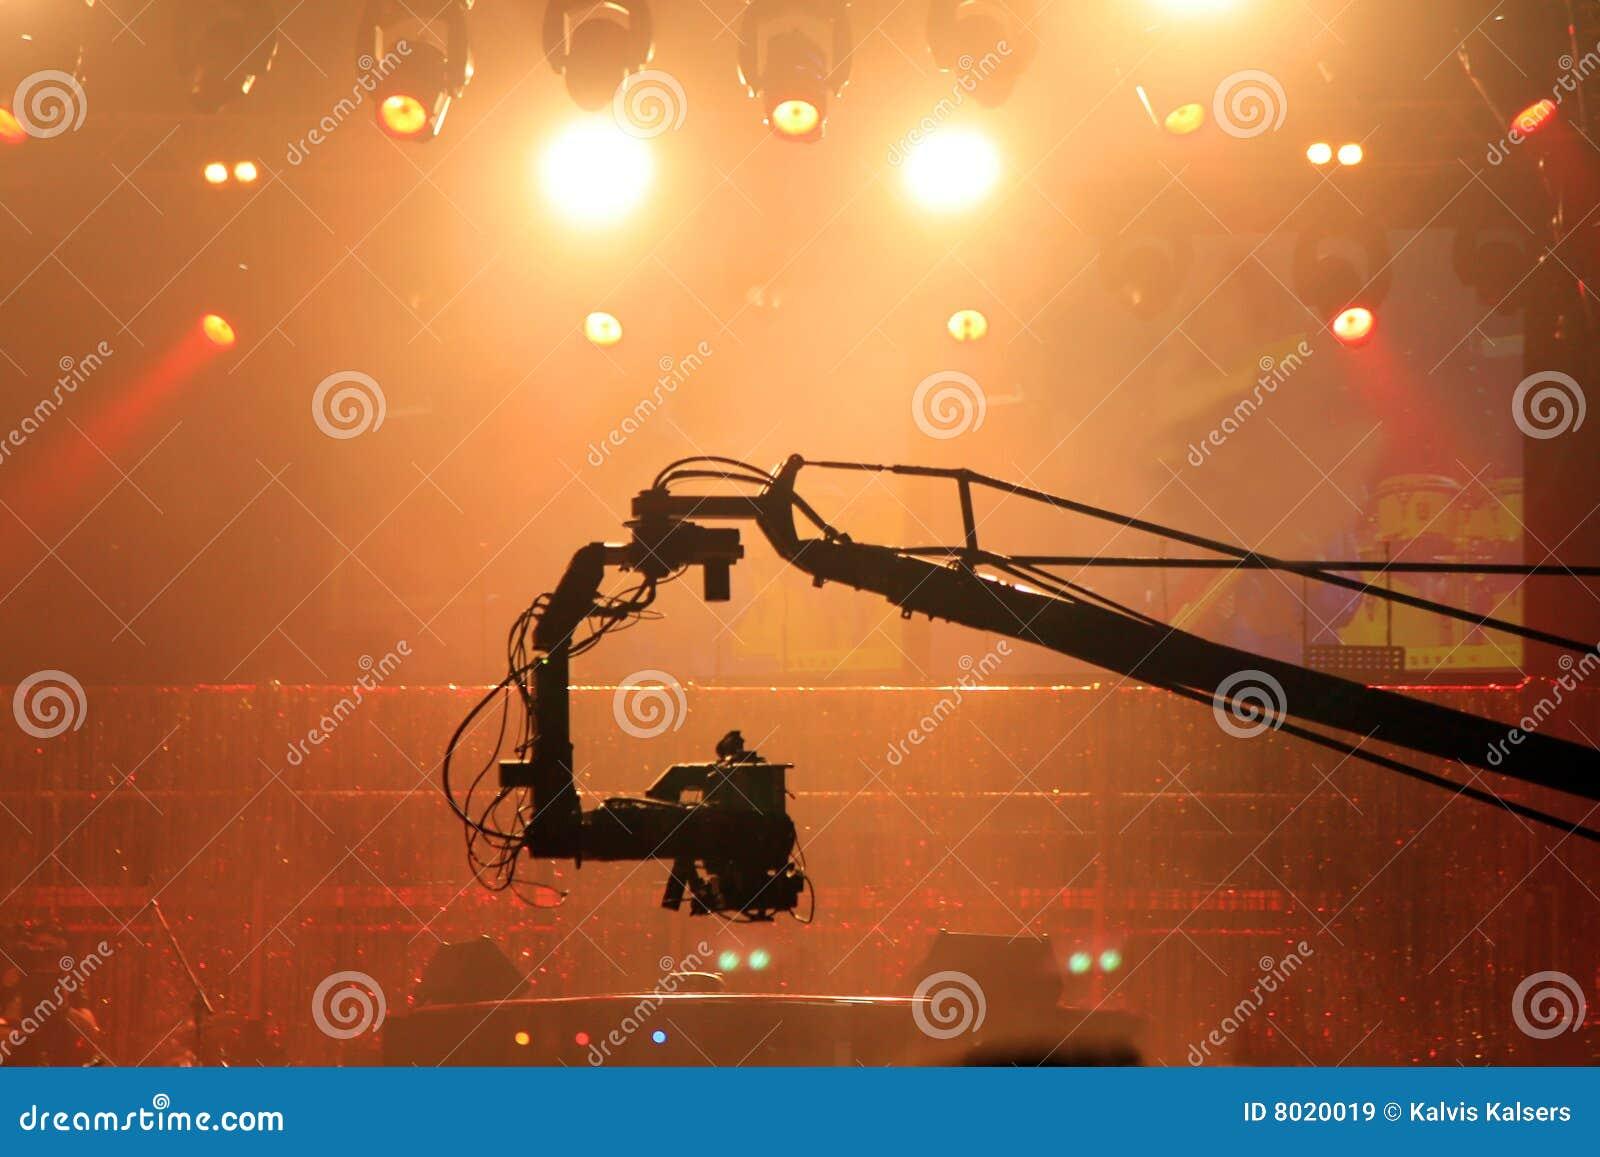 Lights stage video